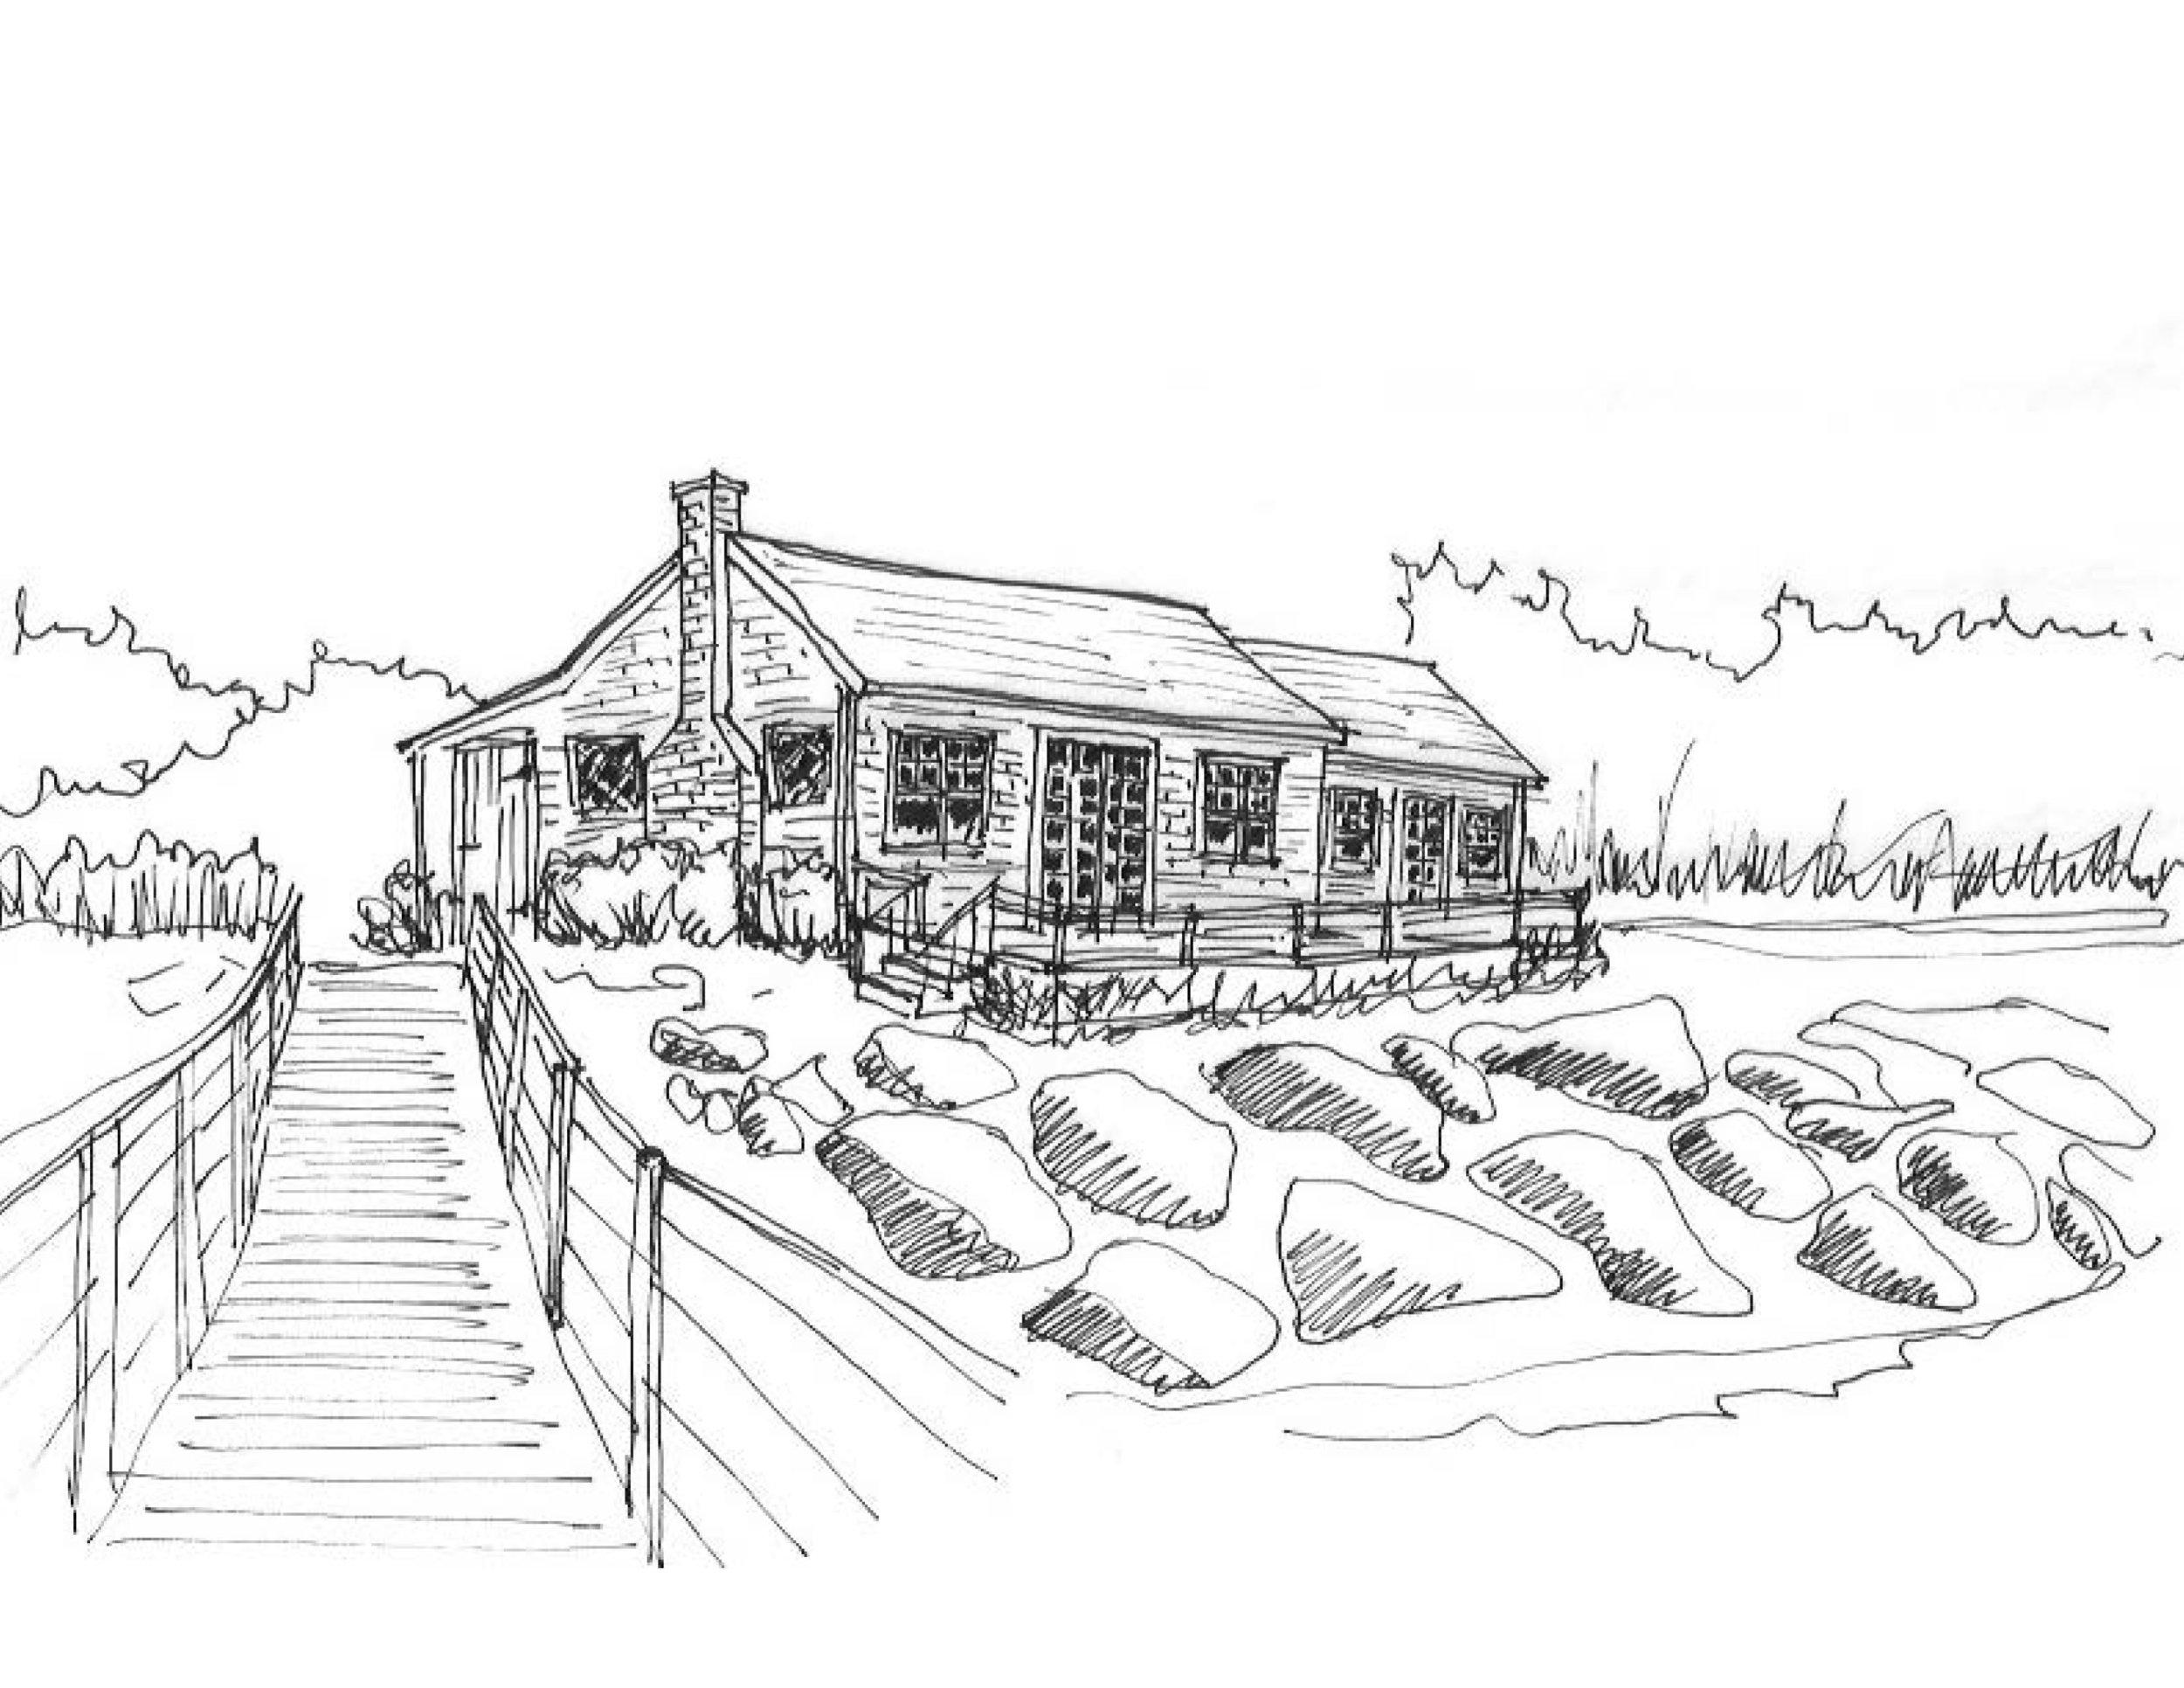 Dock_House_Sketch.jpg